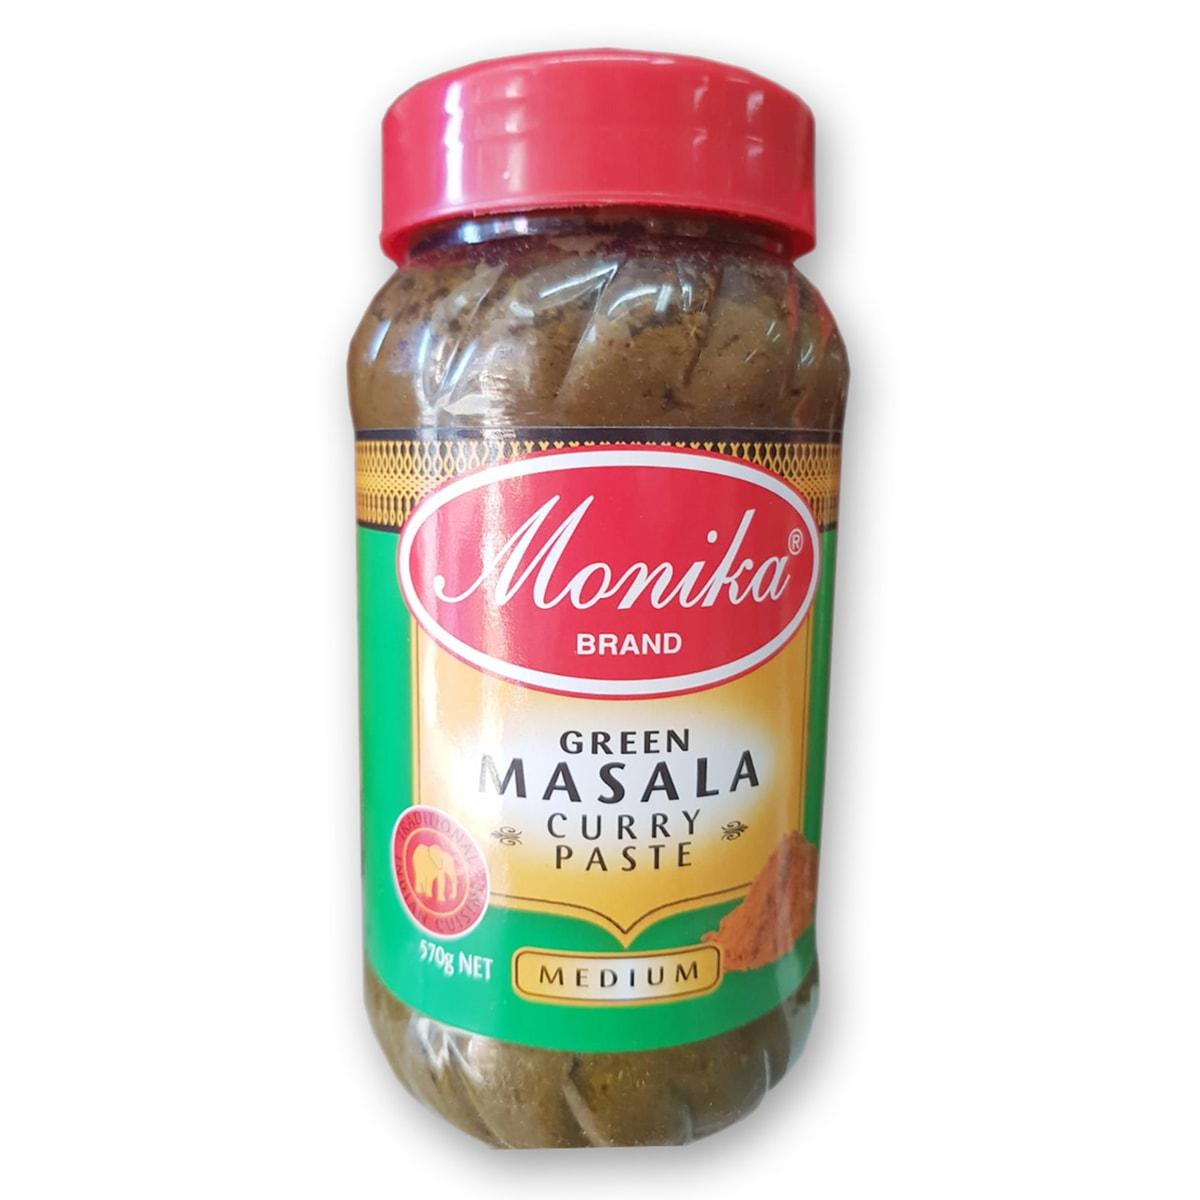 Buy Monika Green Masala Curry Paste (Medium) - 570 gm